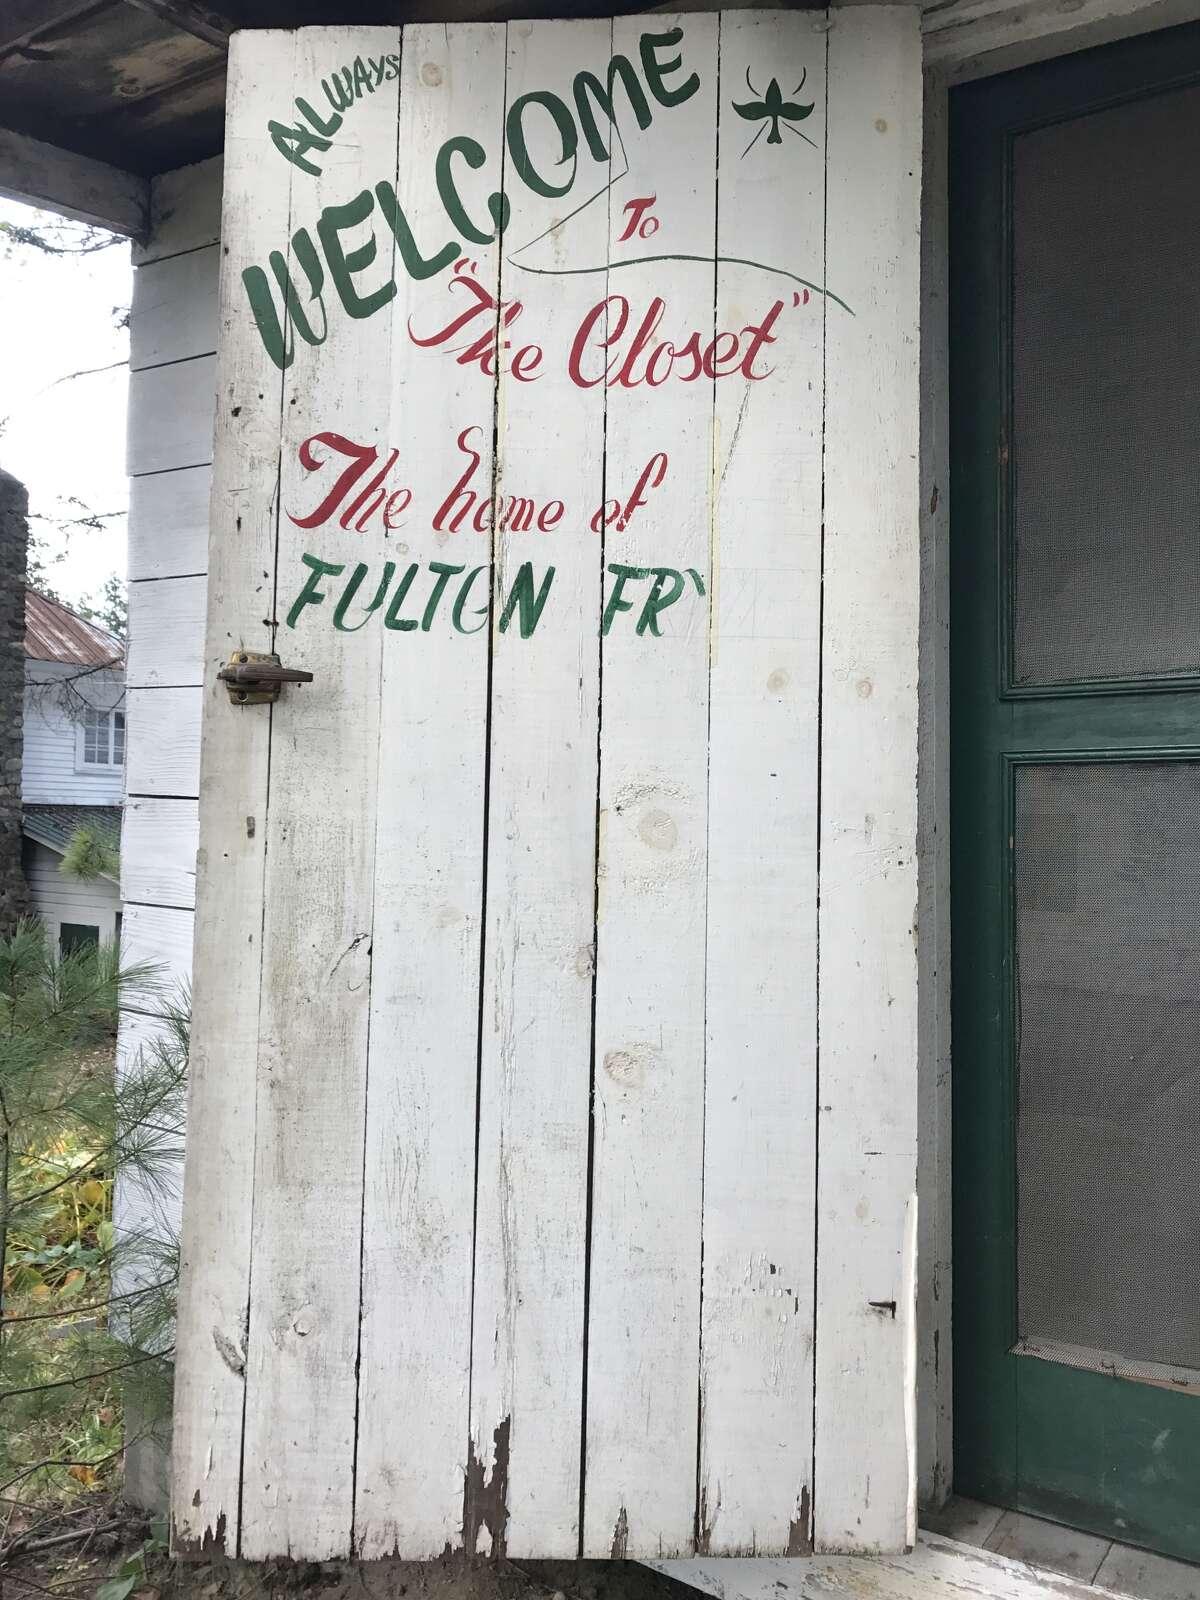 Fulton Fryar's